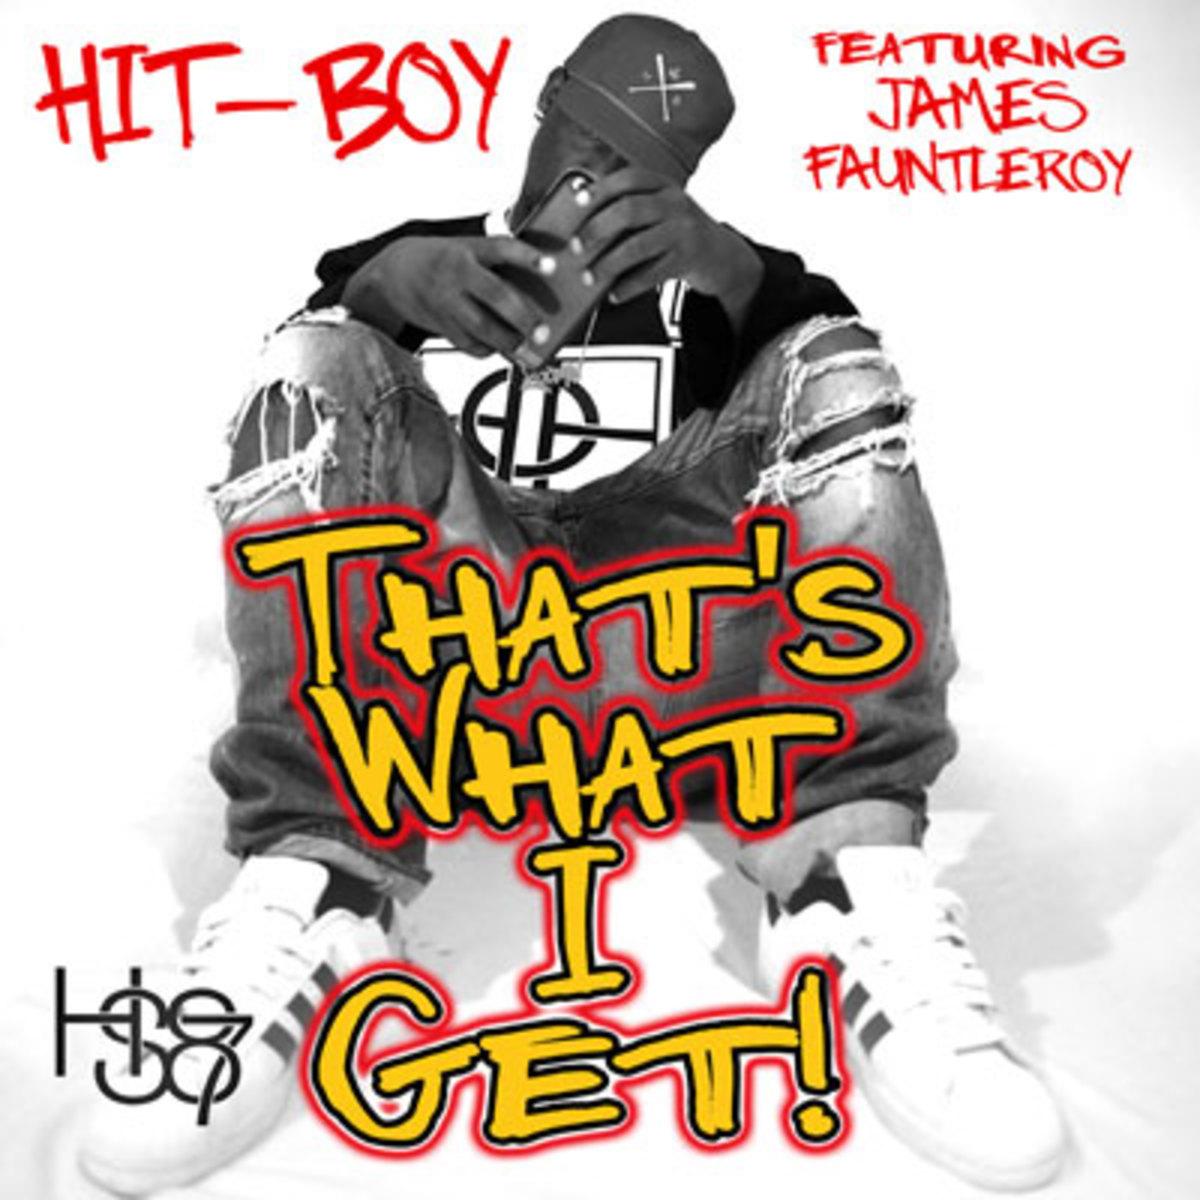 hit-boy-thats-what-i-get.jpg